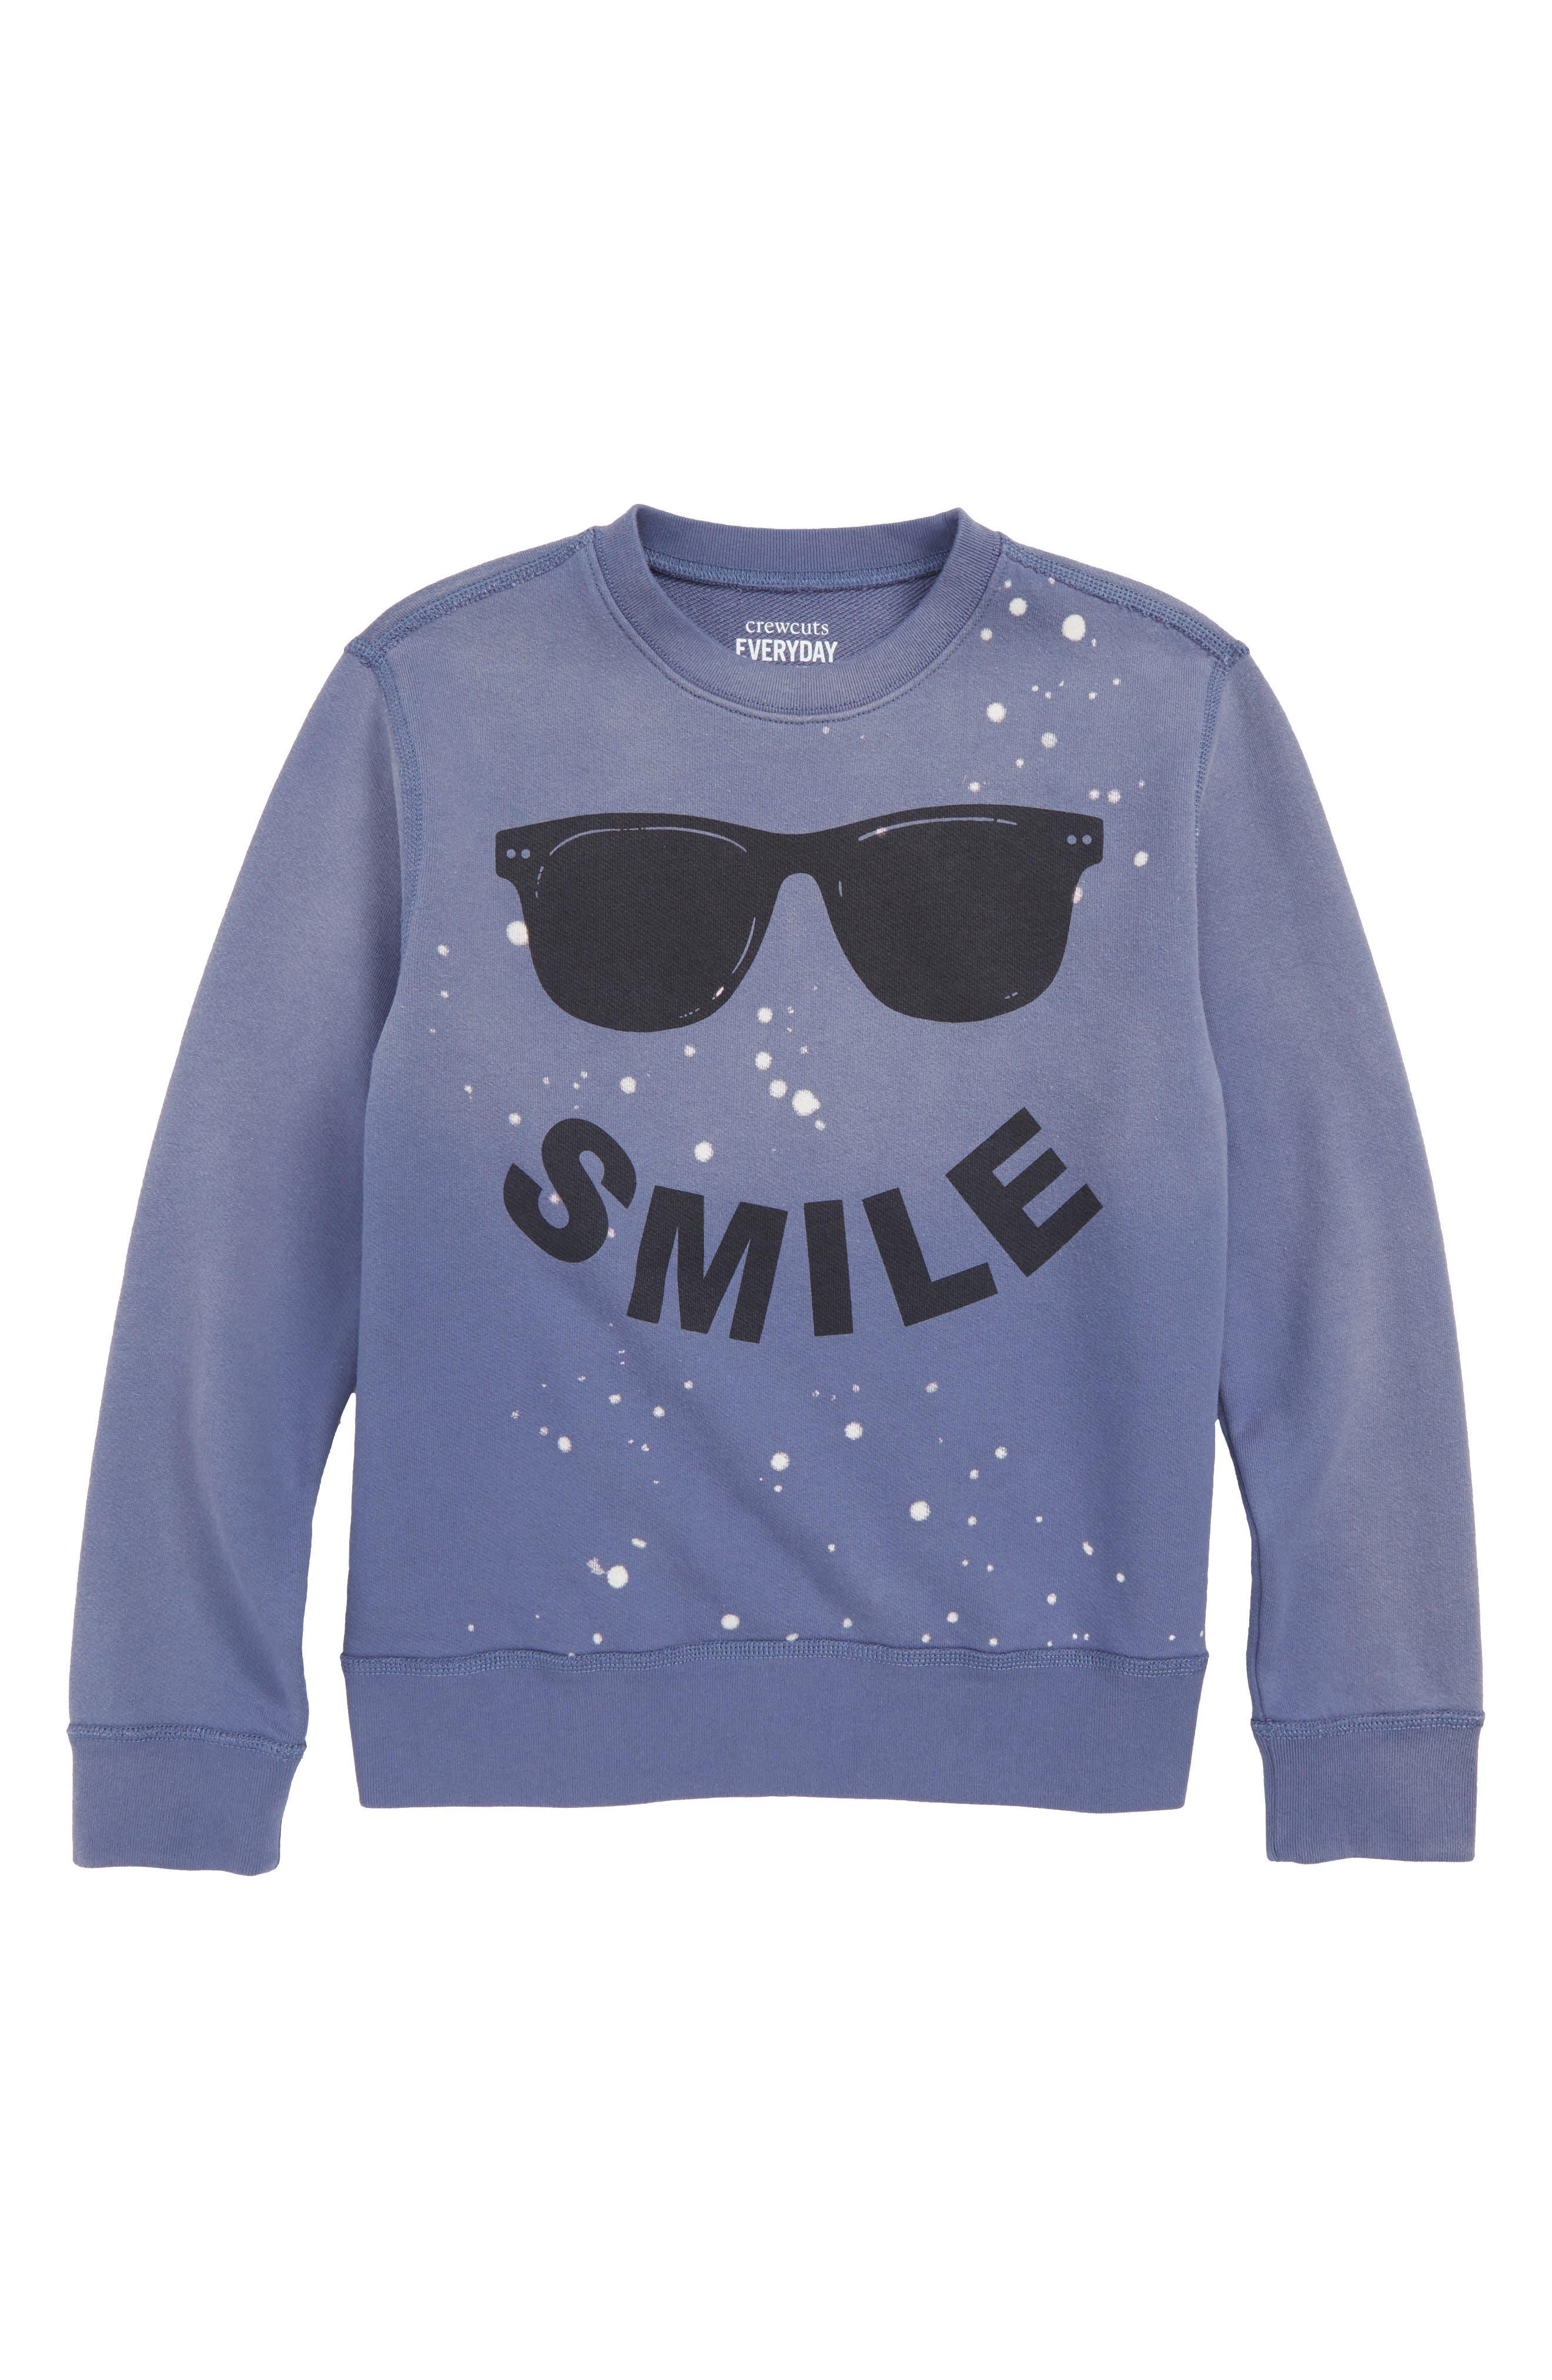 CREWCUTS BY J.CREW Smile Sweatshirt, Main, color, TWILIGHT